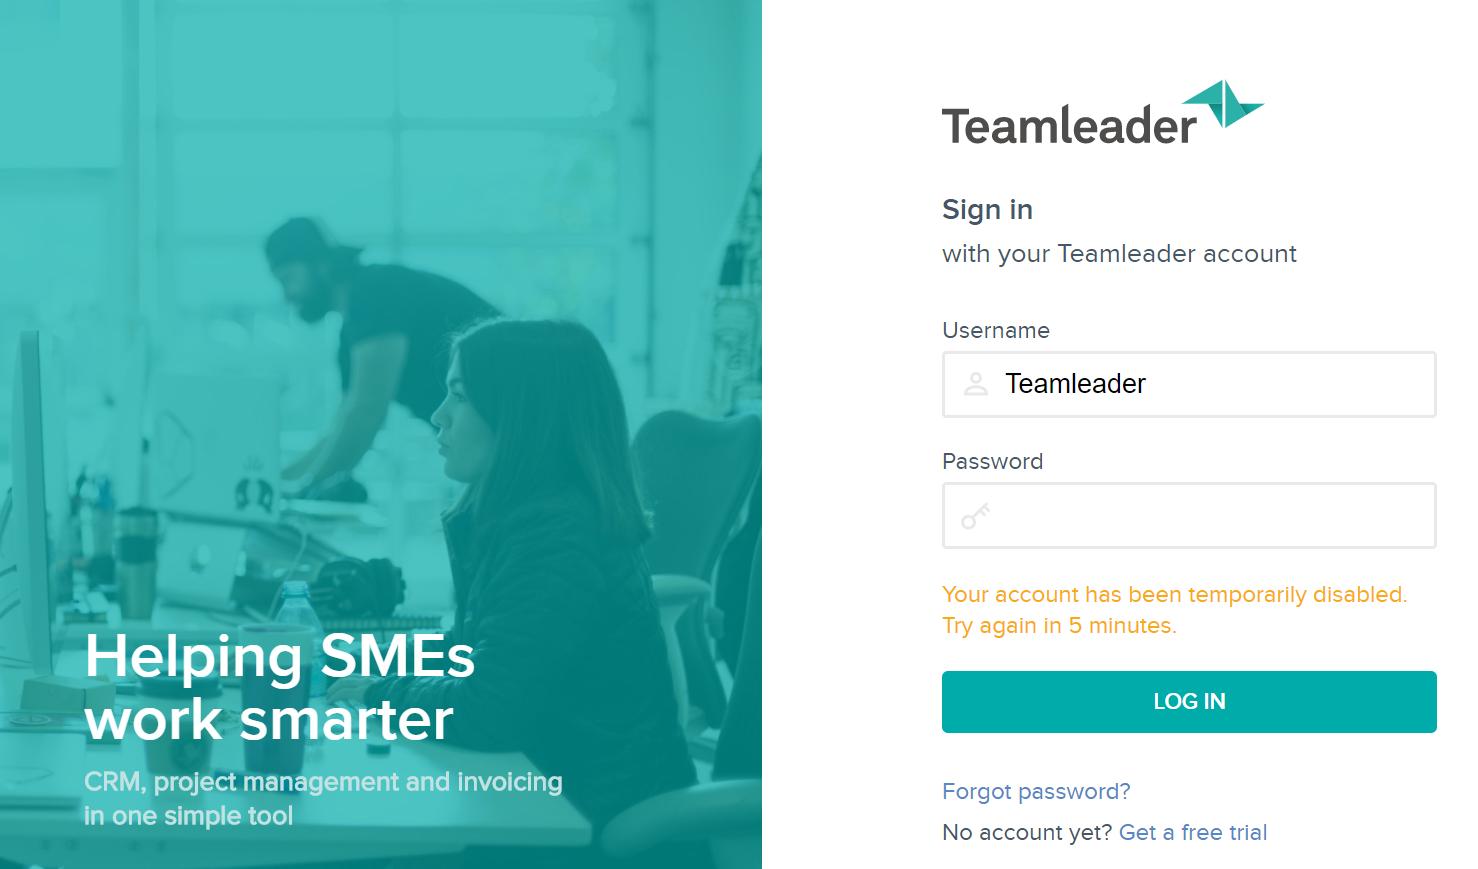 reinitialiser-mot-de-passe-teamleader